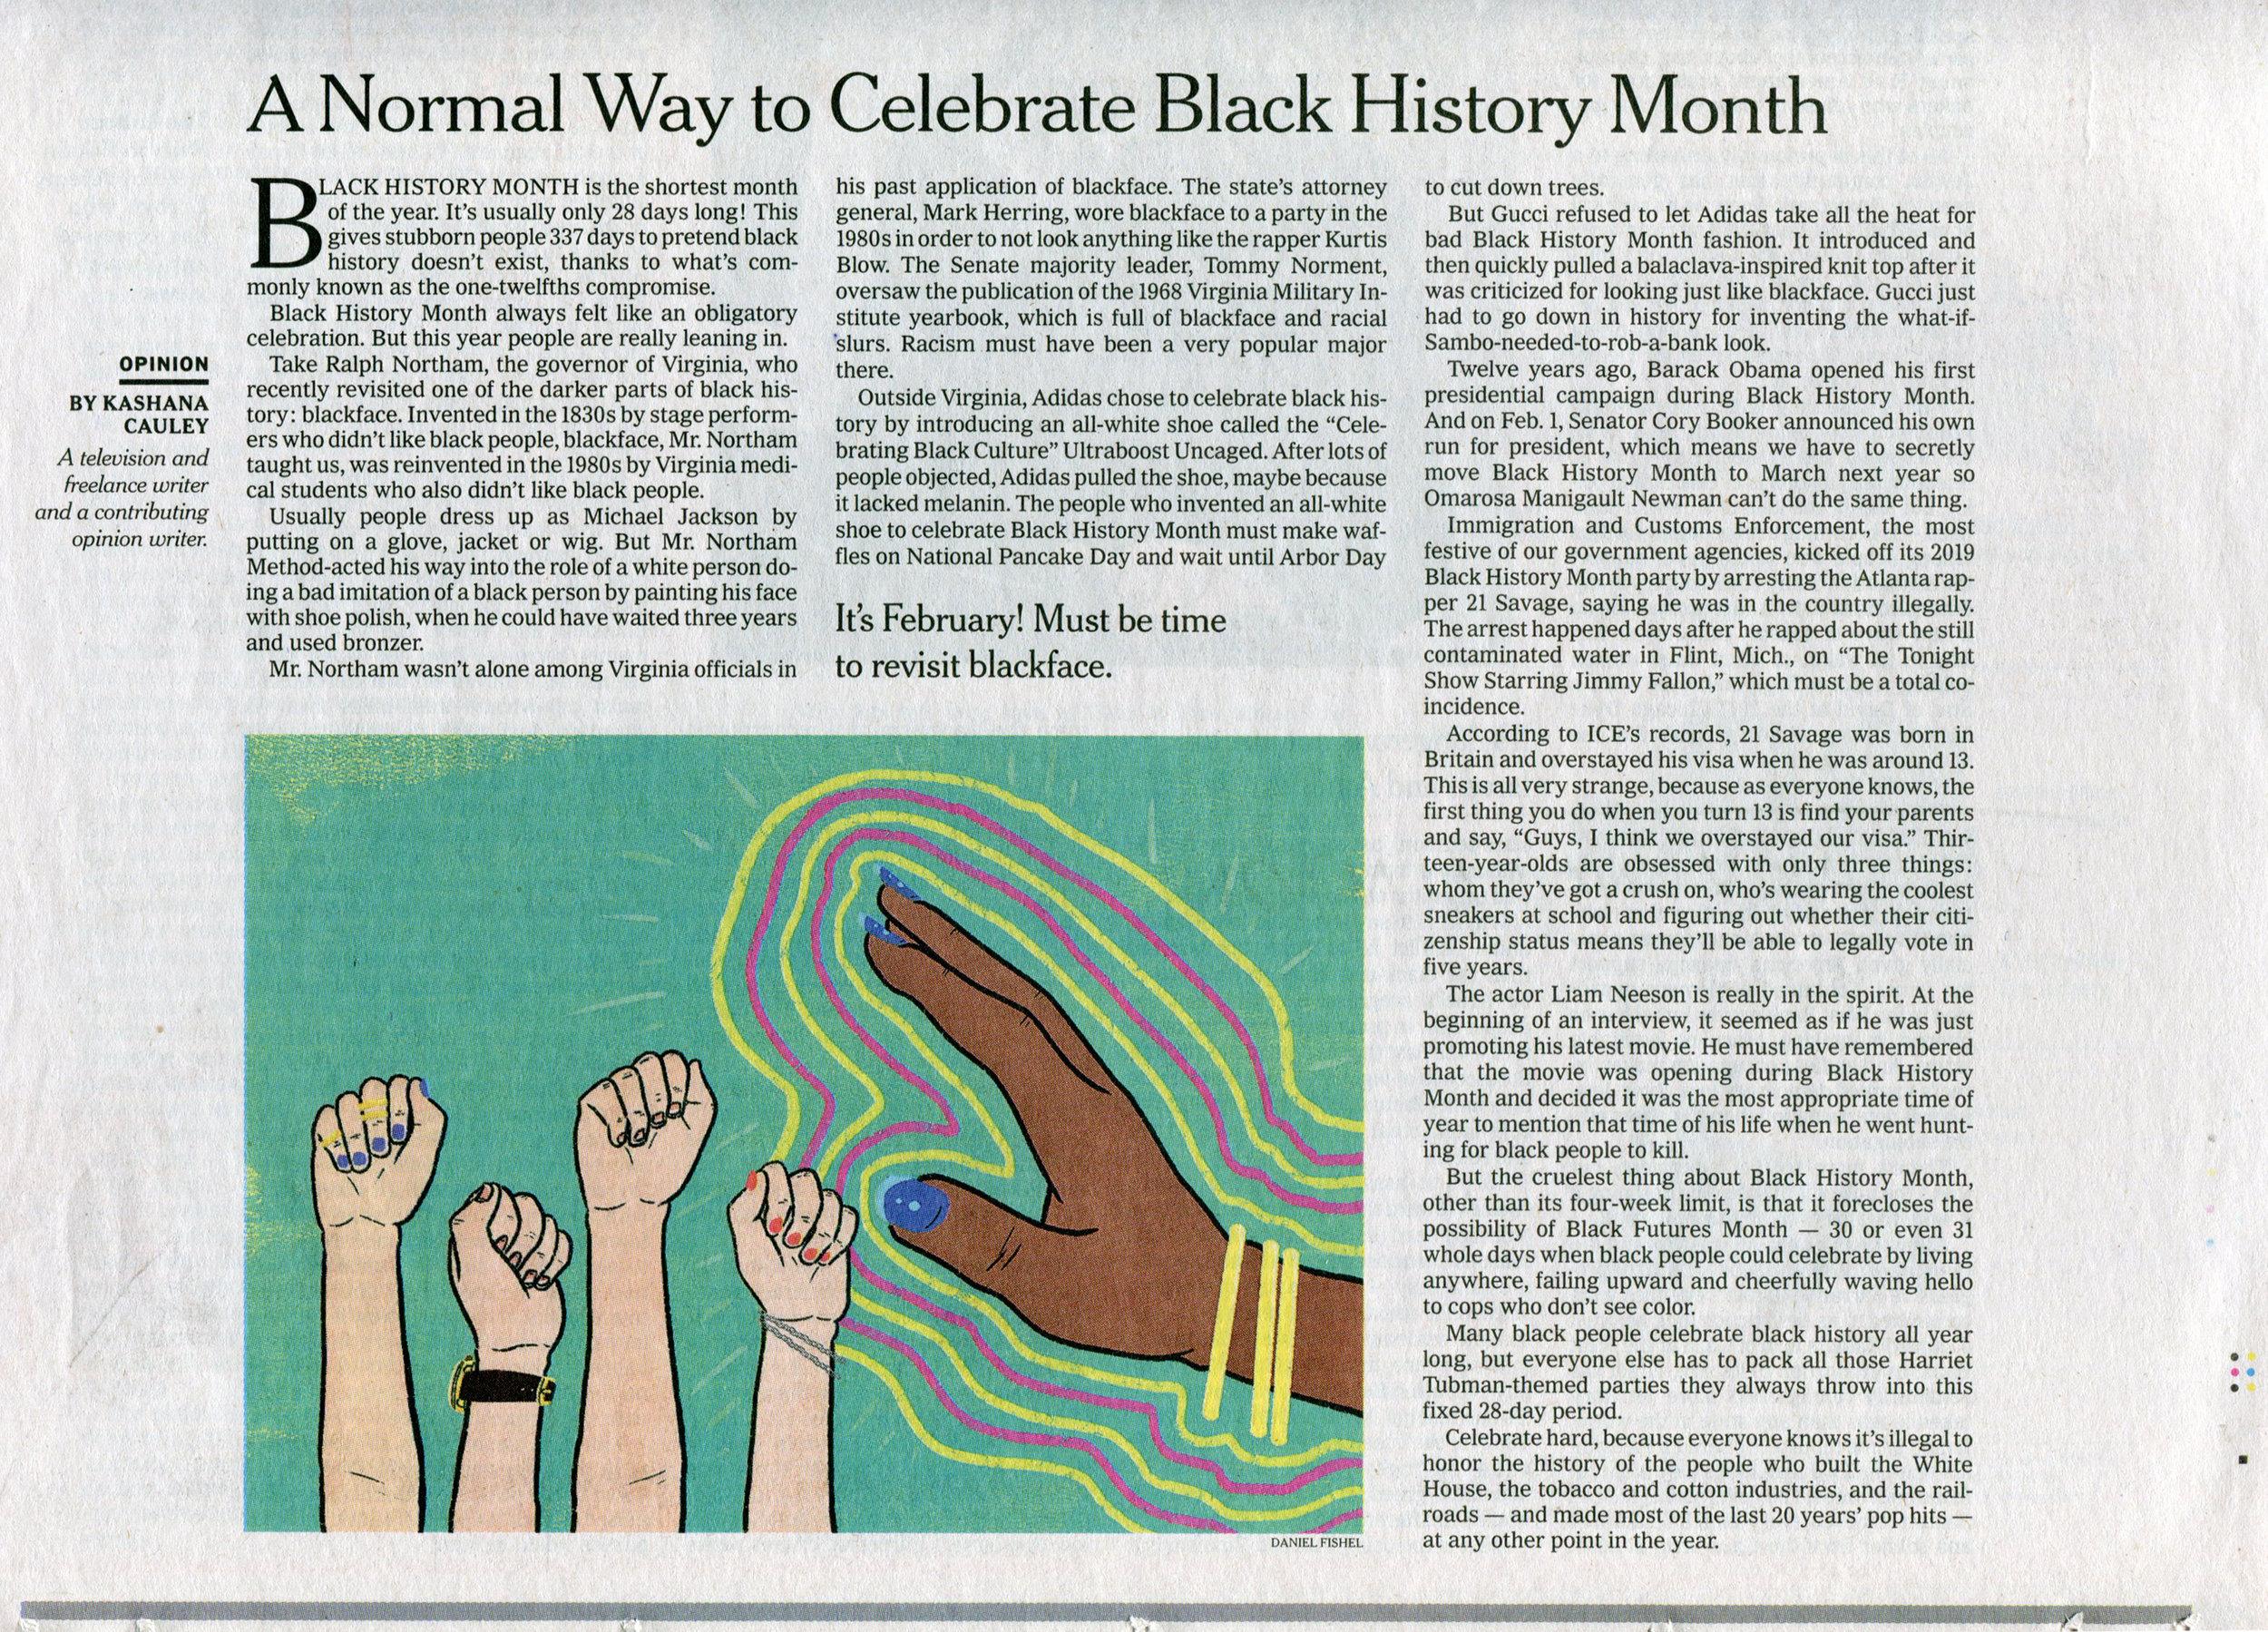 nytimes_blackhistorymonth_printscan_01.jpg